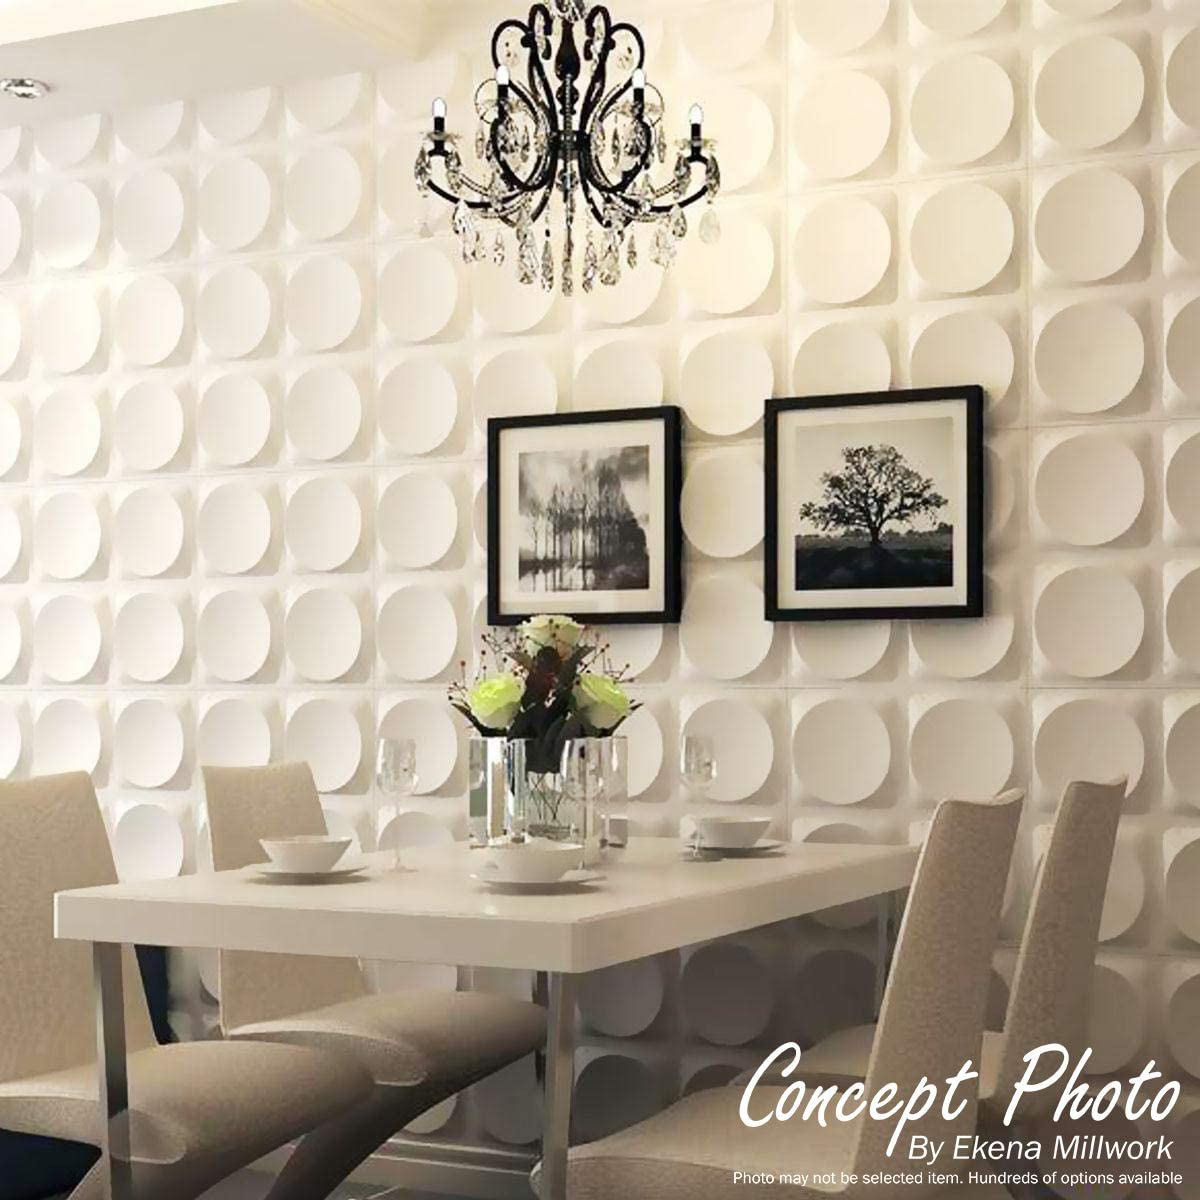 19 5//8W x 19 5//8H Ekena Millwork WP20X20SOWH-CASE-10 Shoreline EnduraWall Decorative 3D Wall Panel White 10 Each